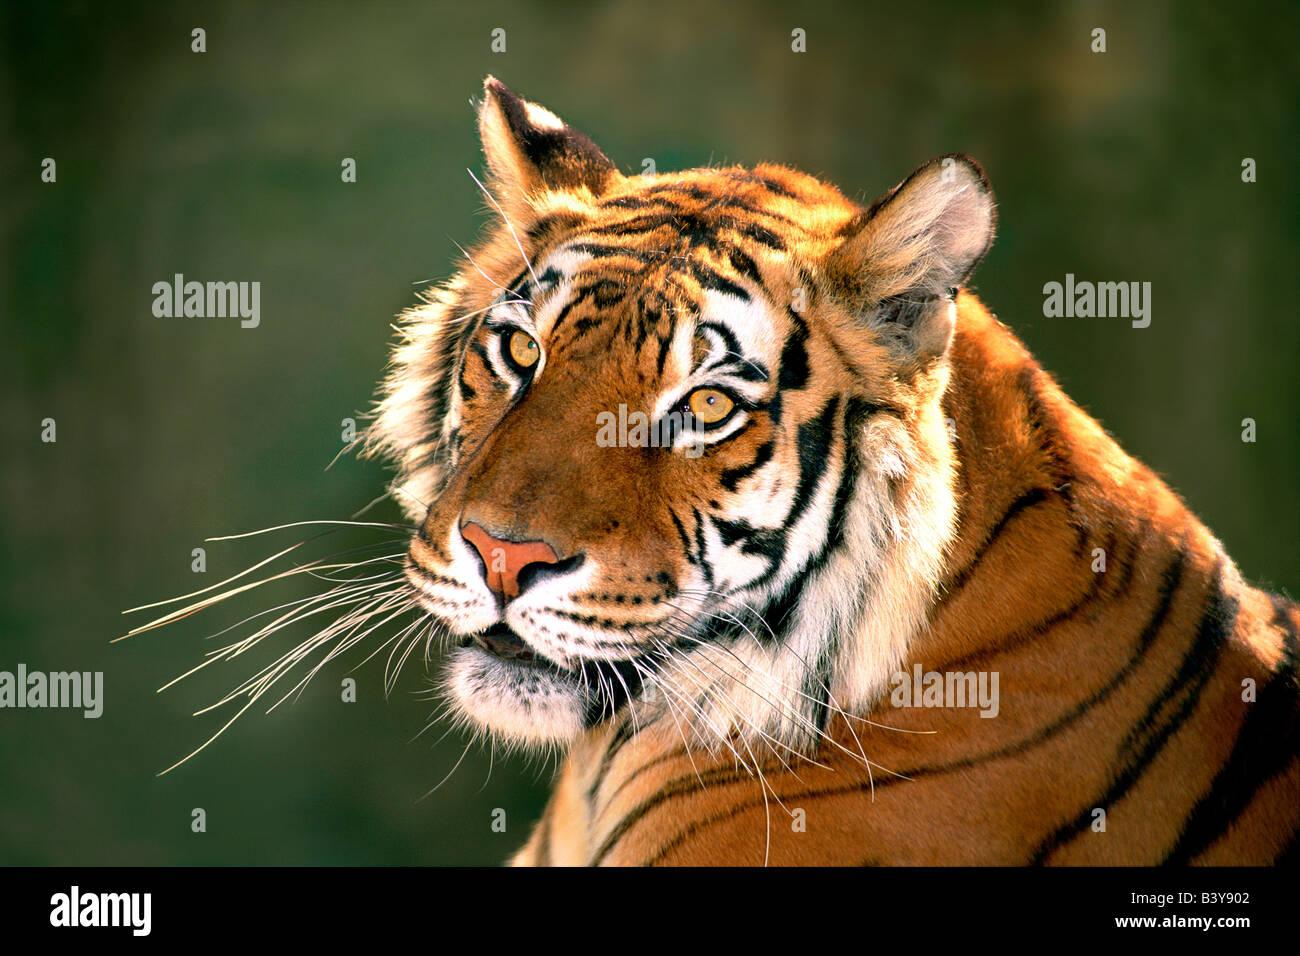 USA, California, Los Angeles County. Porträt von Bengal Tiger in Wildlife Waystation Rettungs-Anlage. (Captive) Stockbild